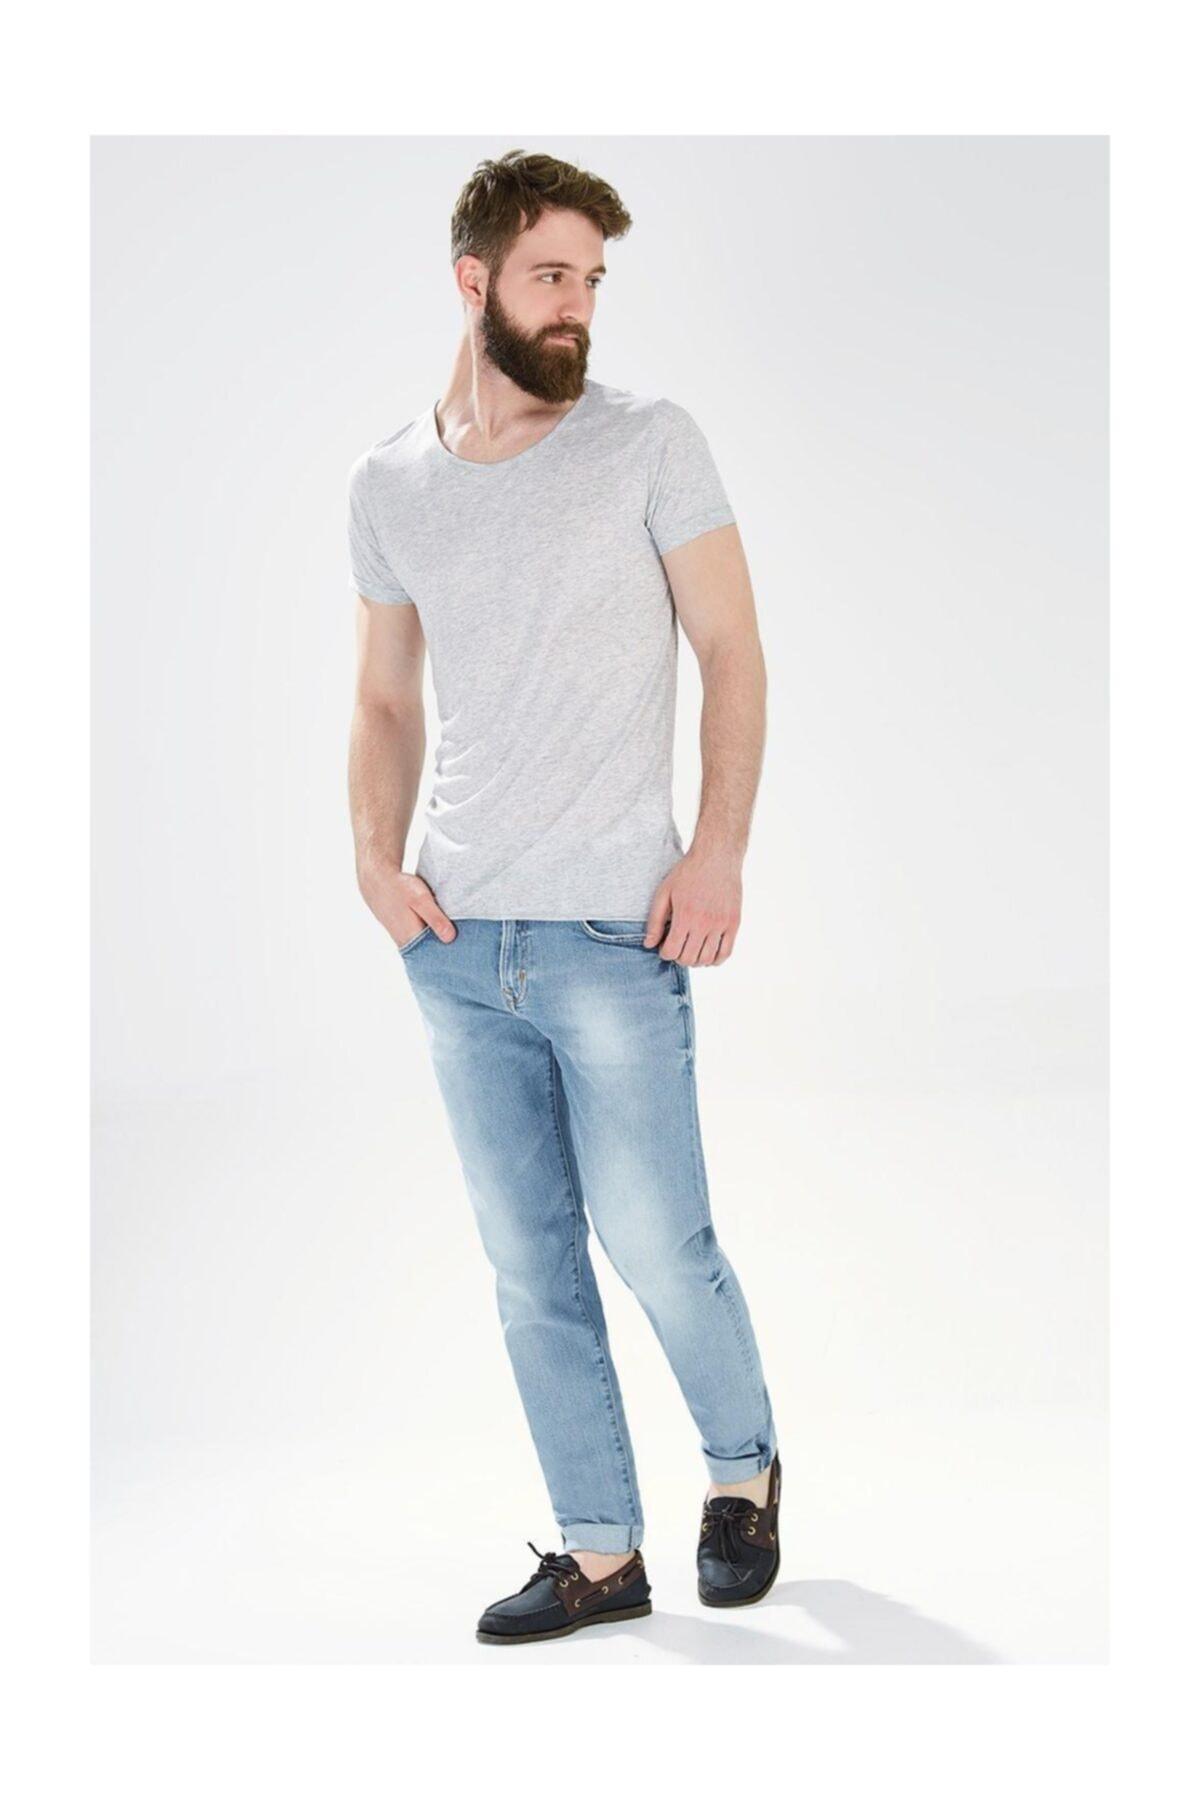 Ltb Dıego Fredrıck Wash Jeans Pantolon 0100950260135022262 2